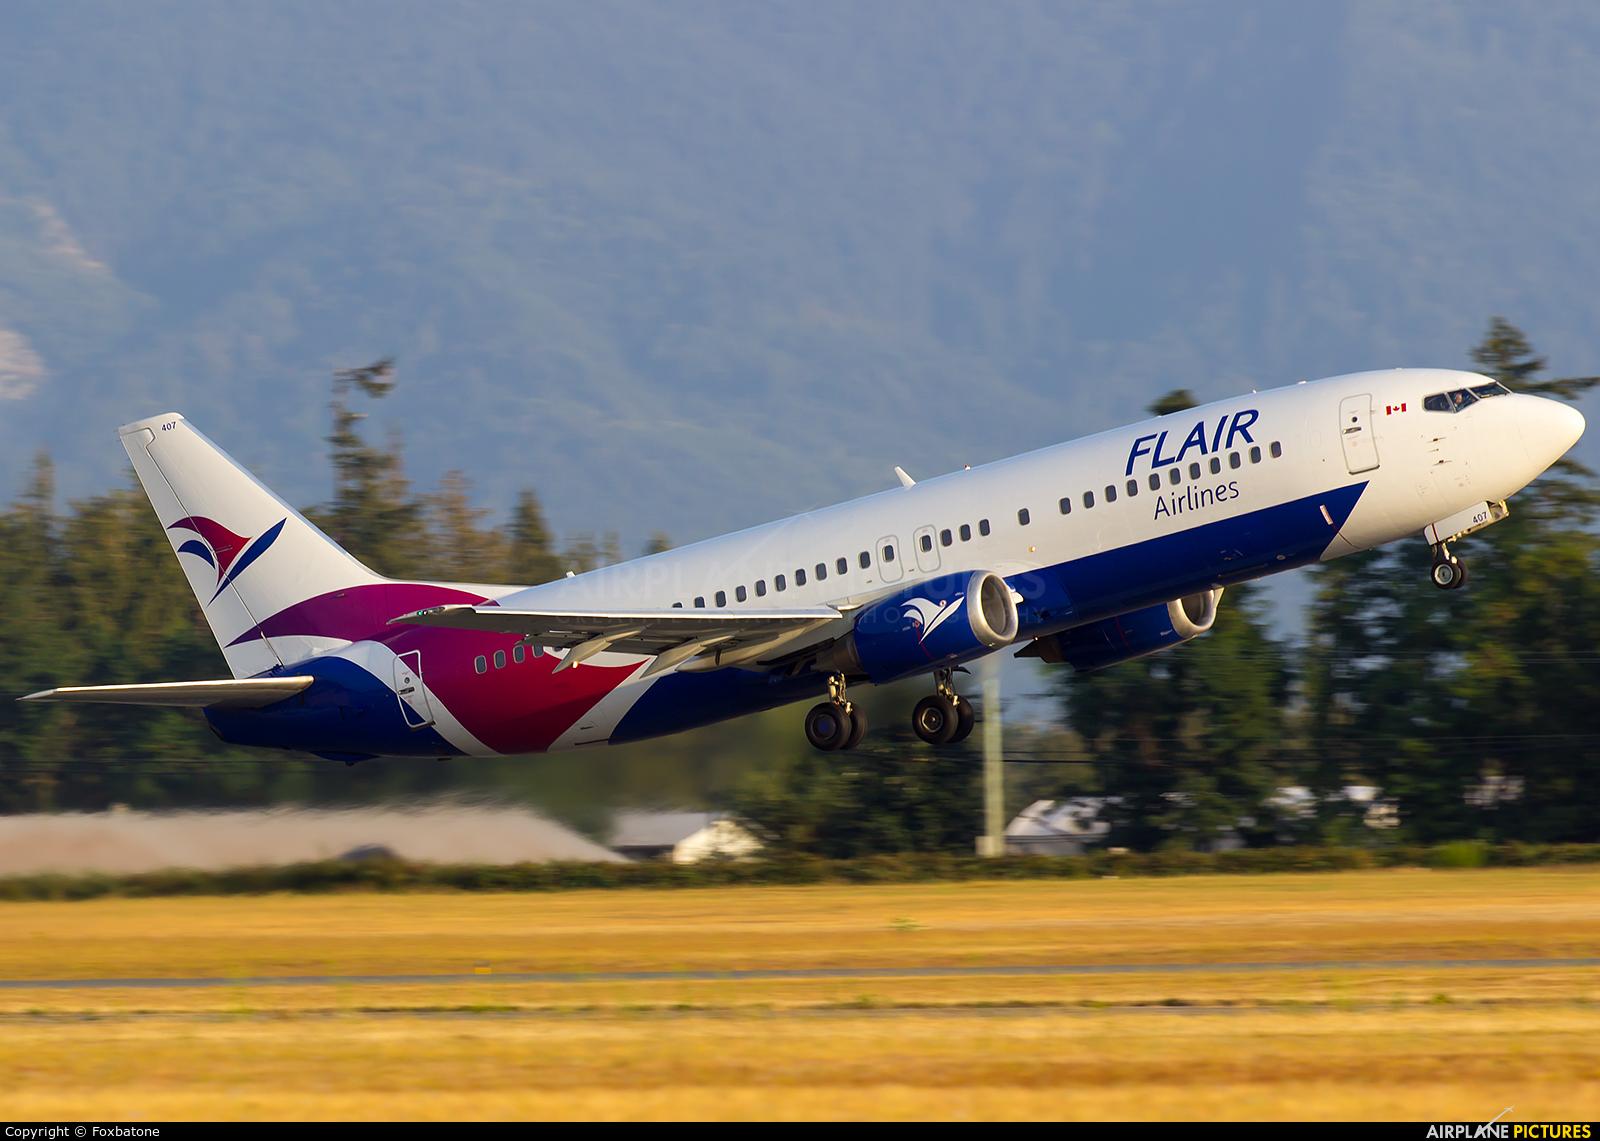 Flair Air C-FLHE aircraft at Abbotsford, BC